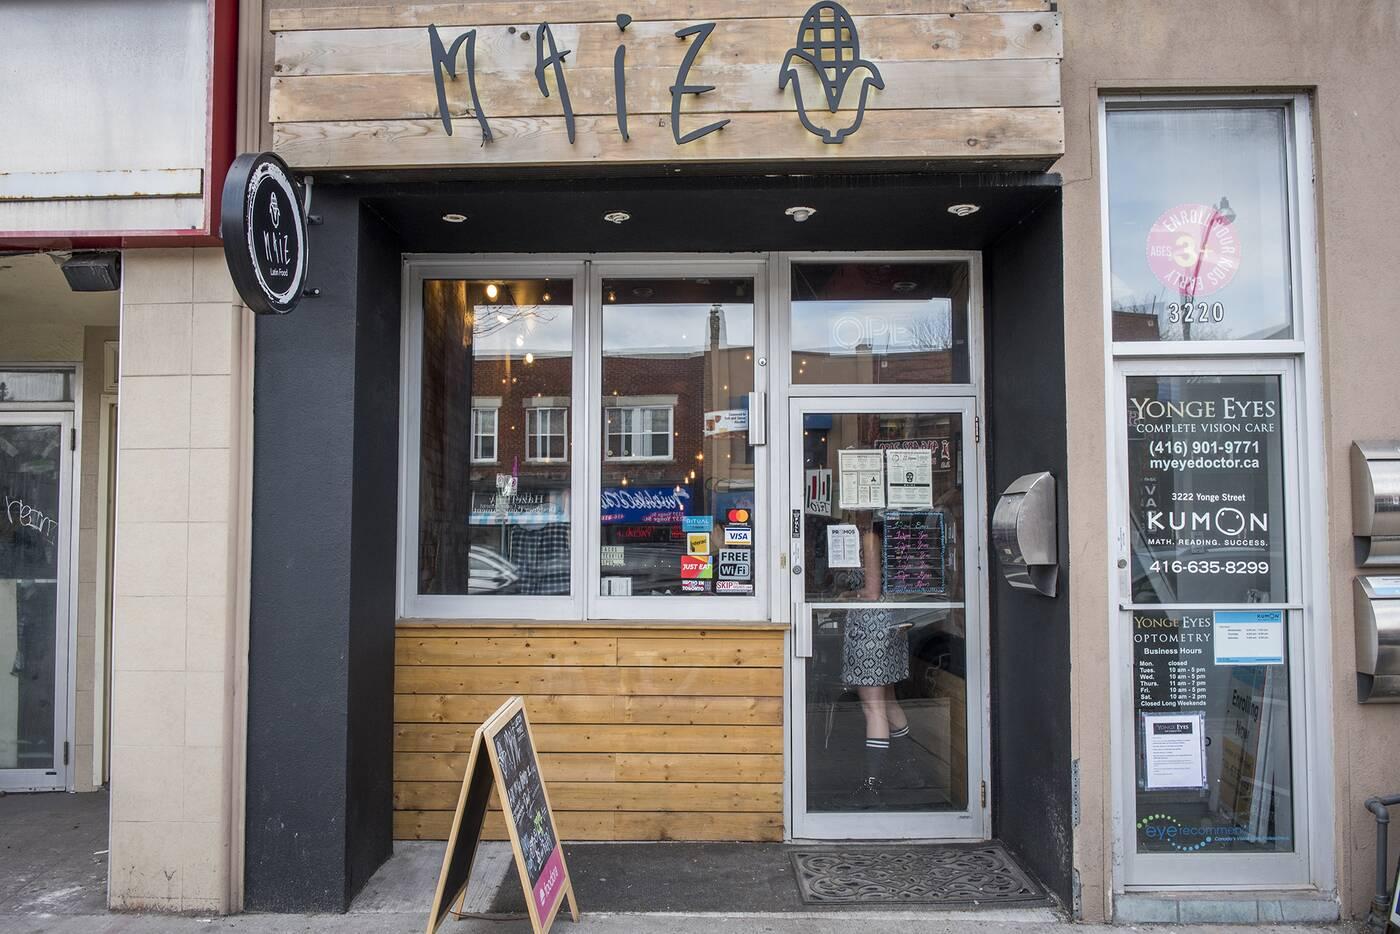 Maiz Toronto